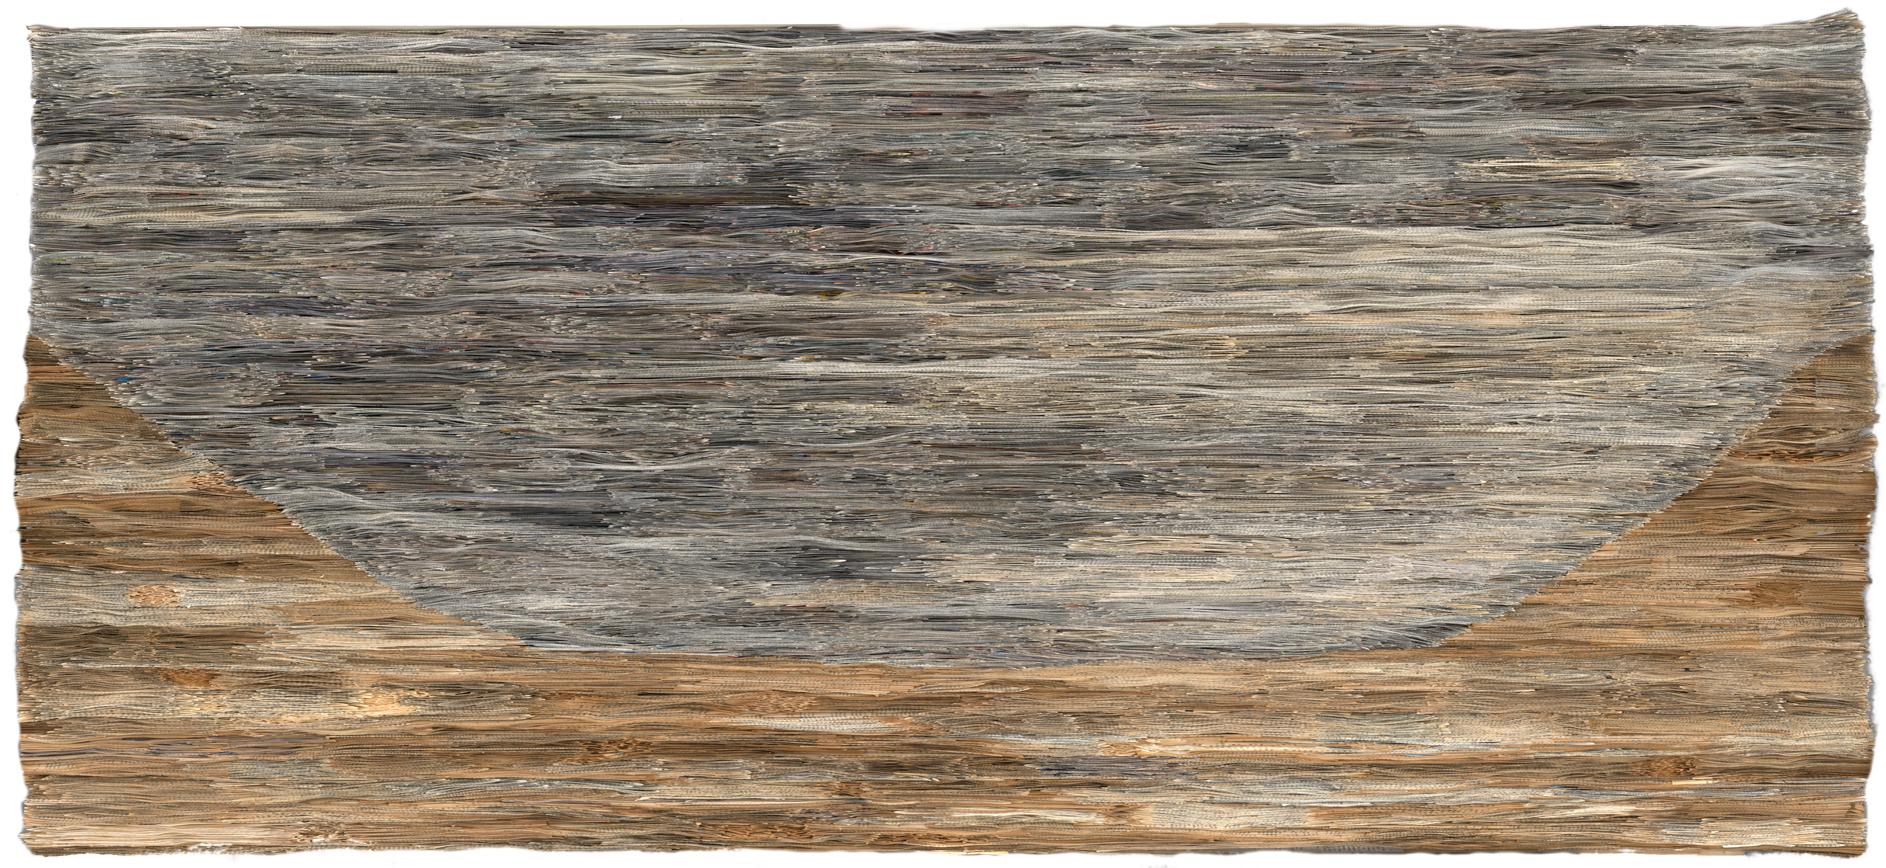 Earth Mountain | Folded paper | 200x88cm